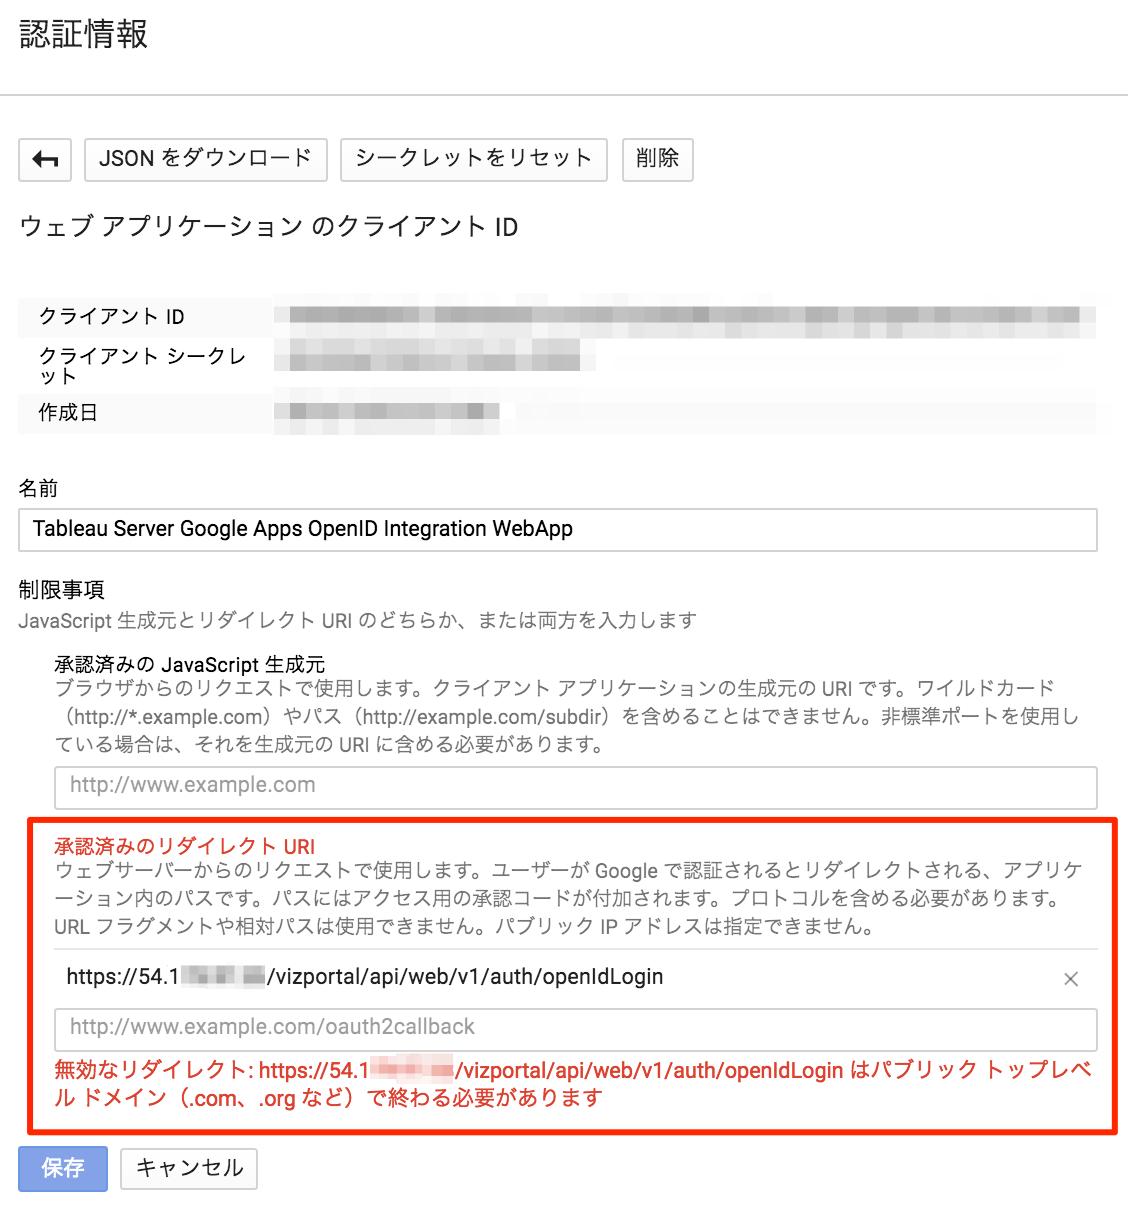 tableau-googleapps-openid-integration_10